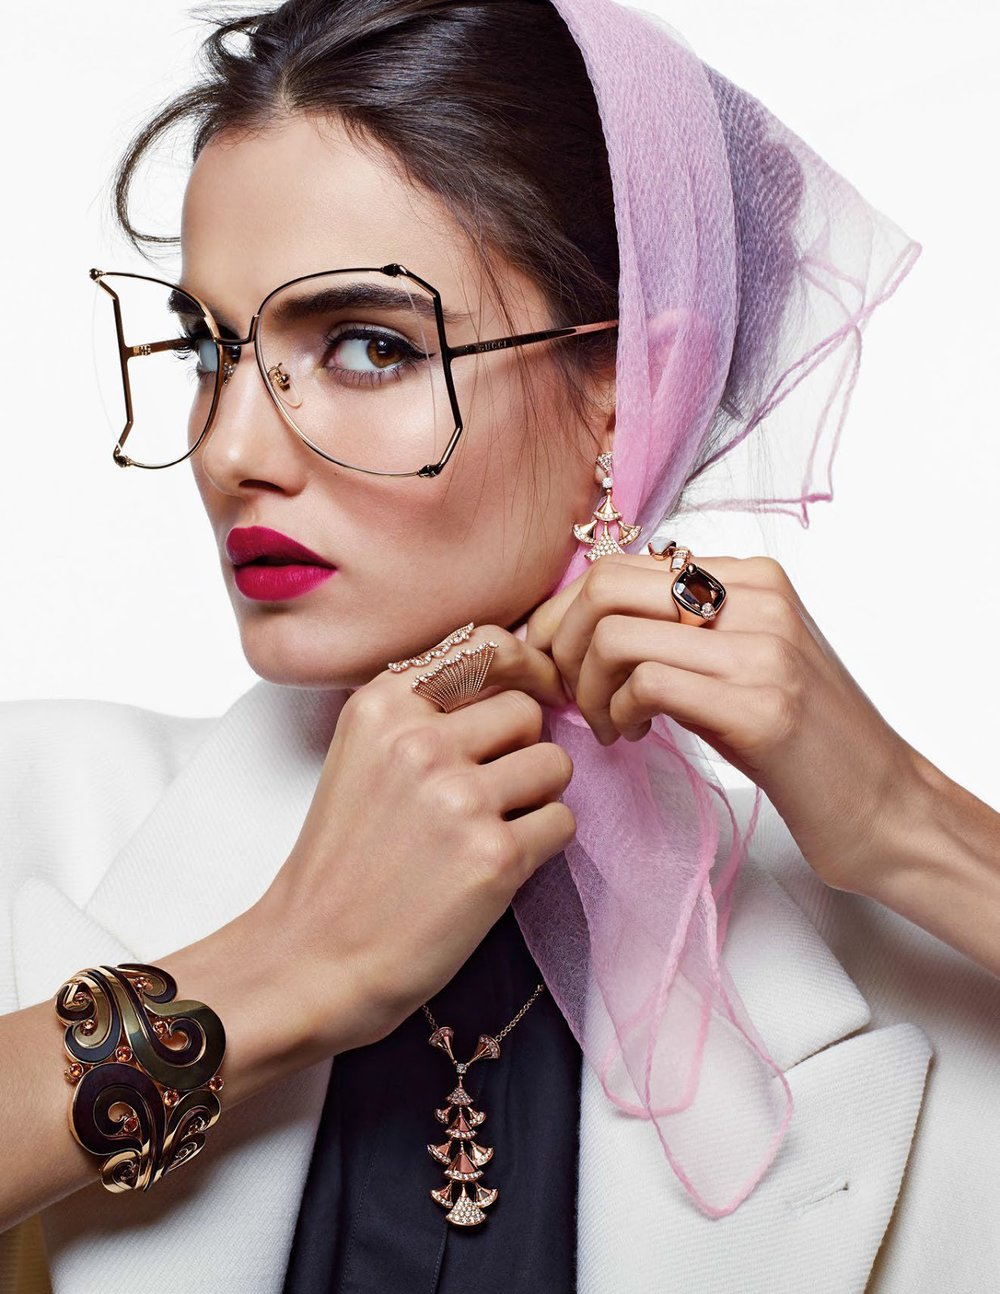 Vogue Arabia December 2017 - 5.jpg